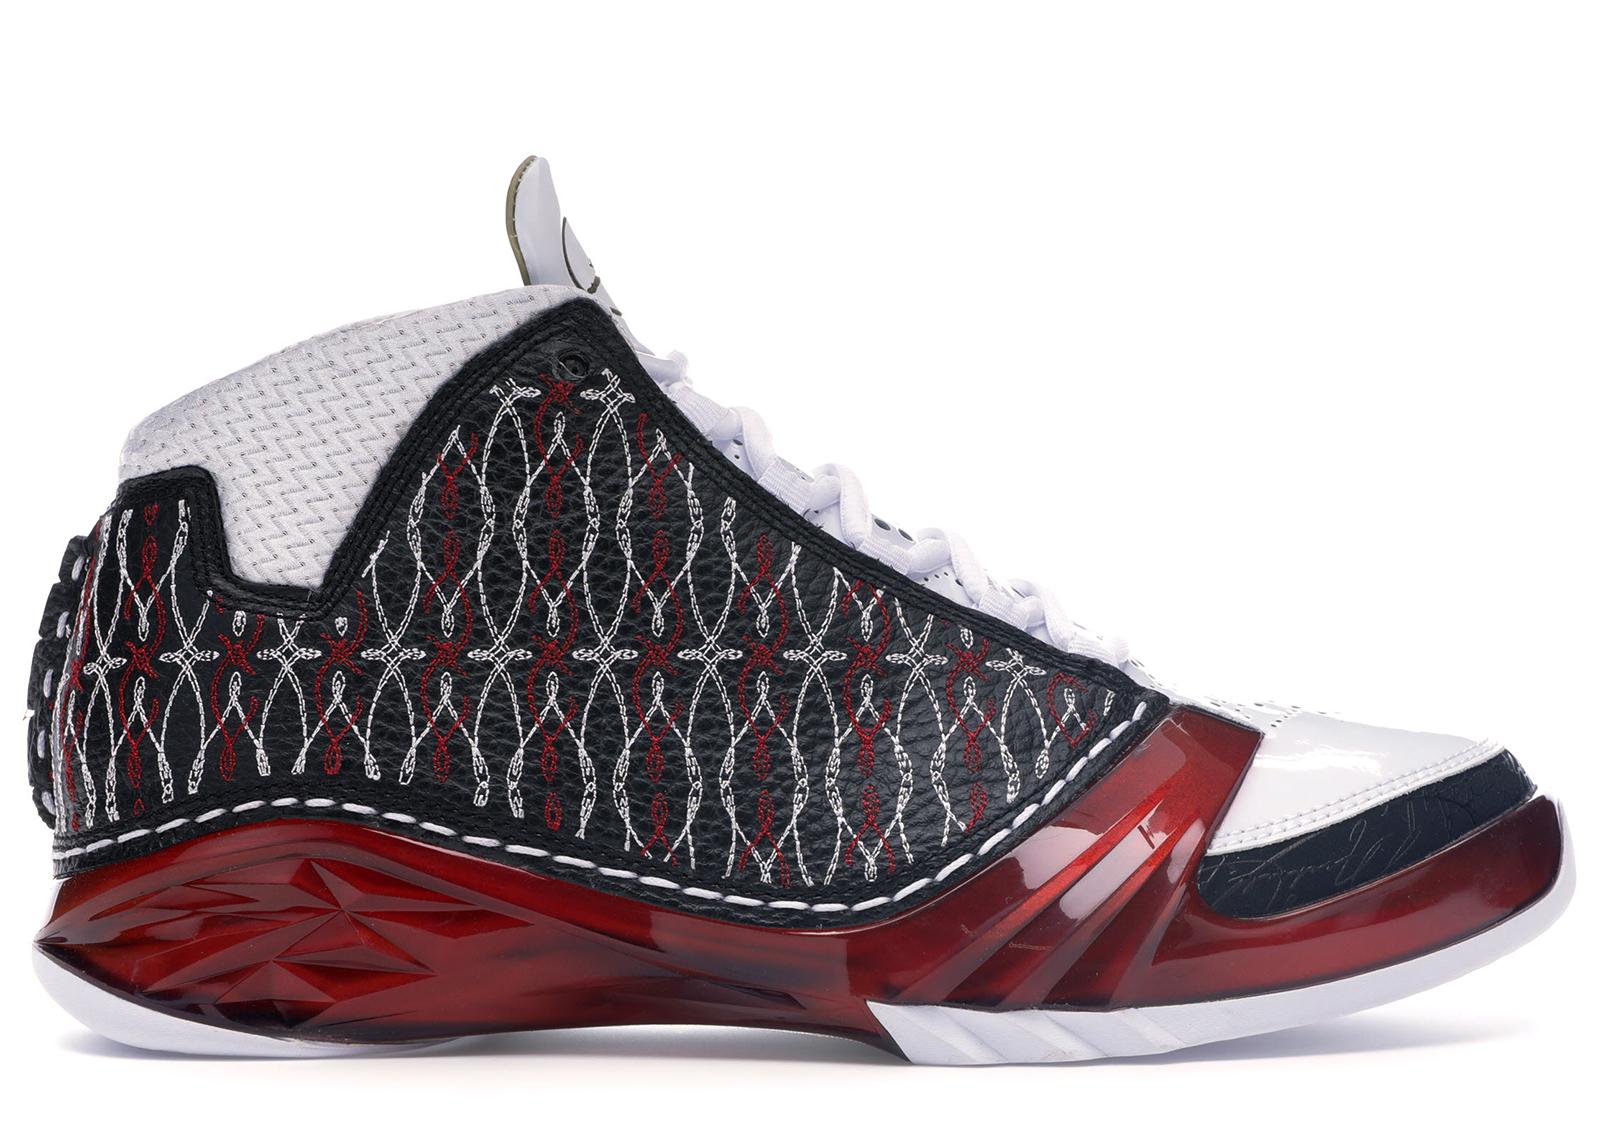 Buy Air Jordan 23 Shoes & Deadstock Sneakers